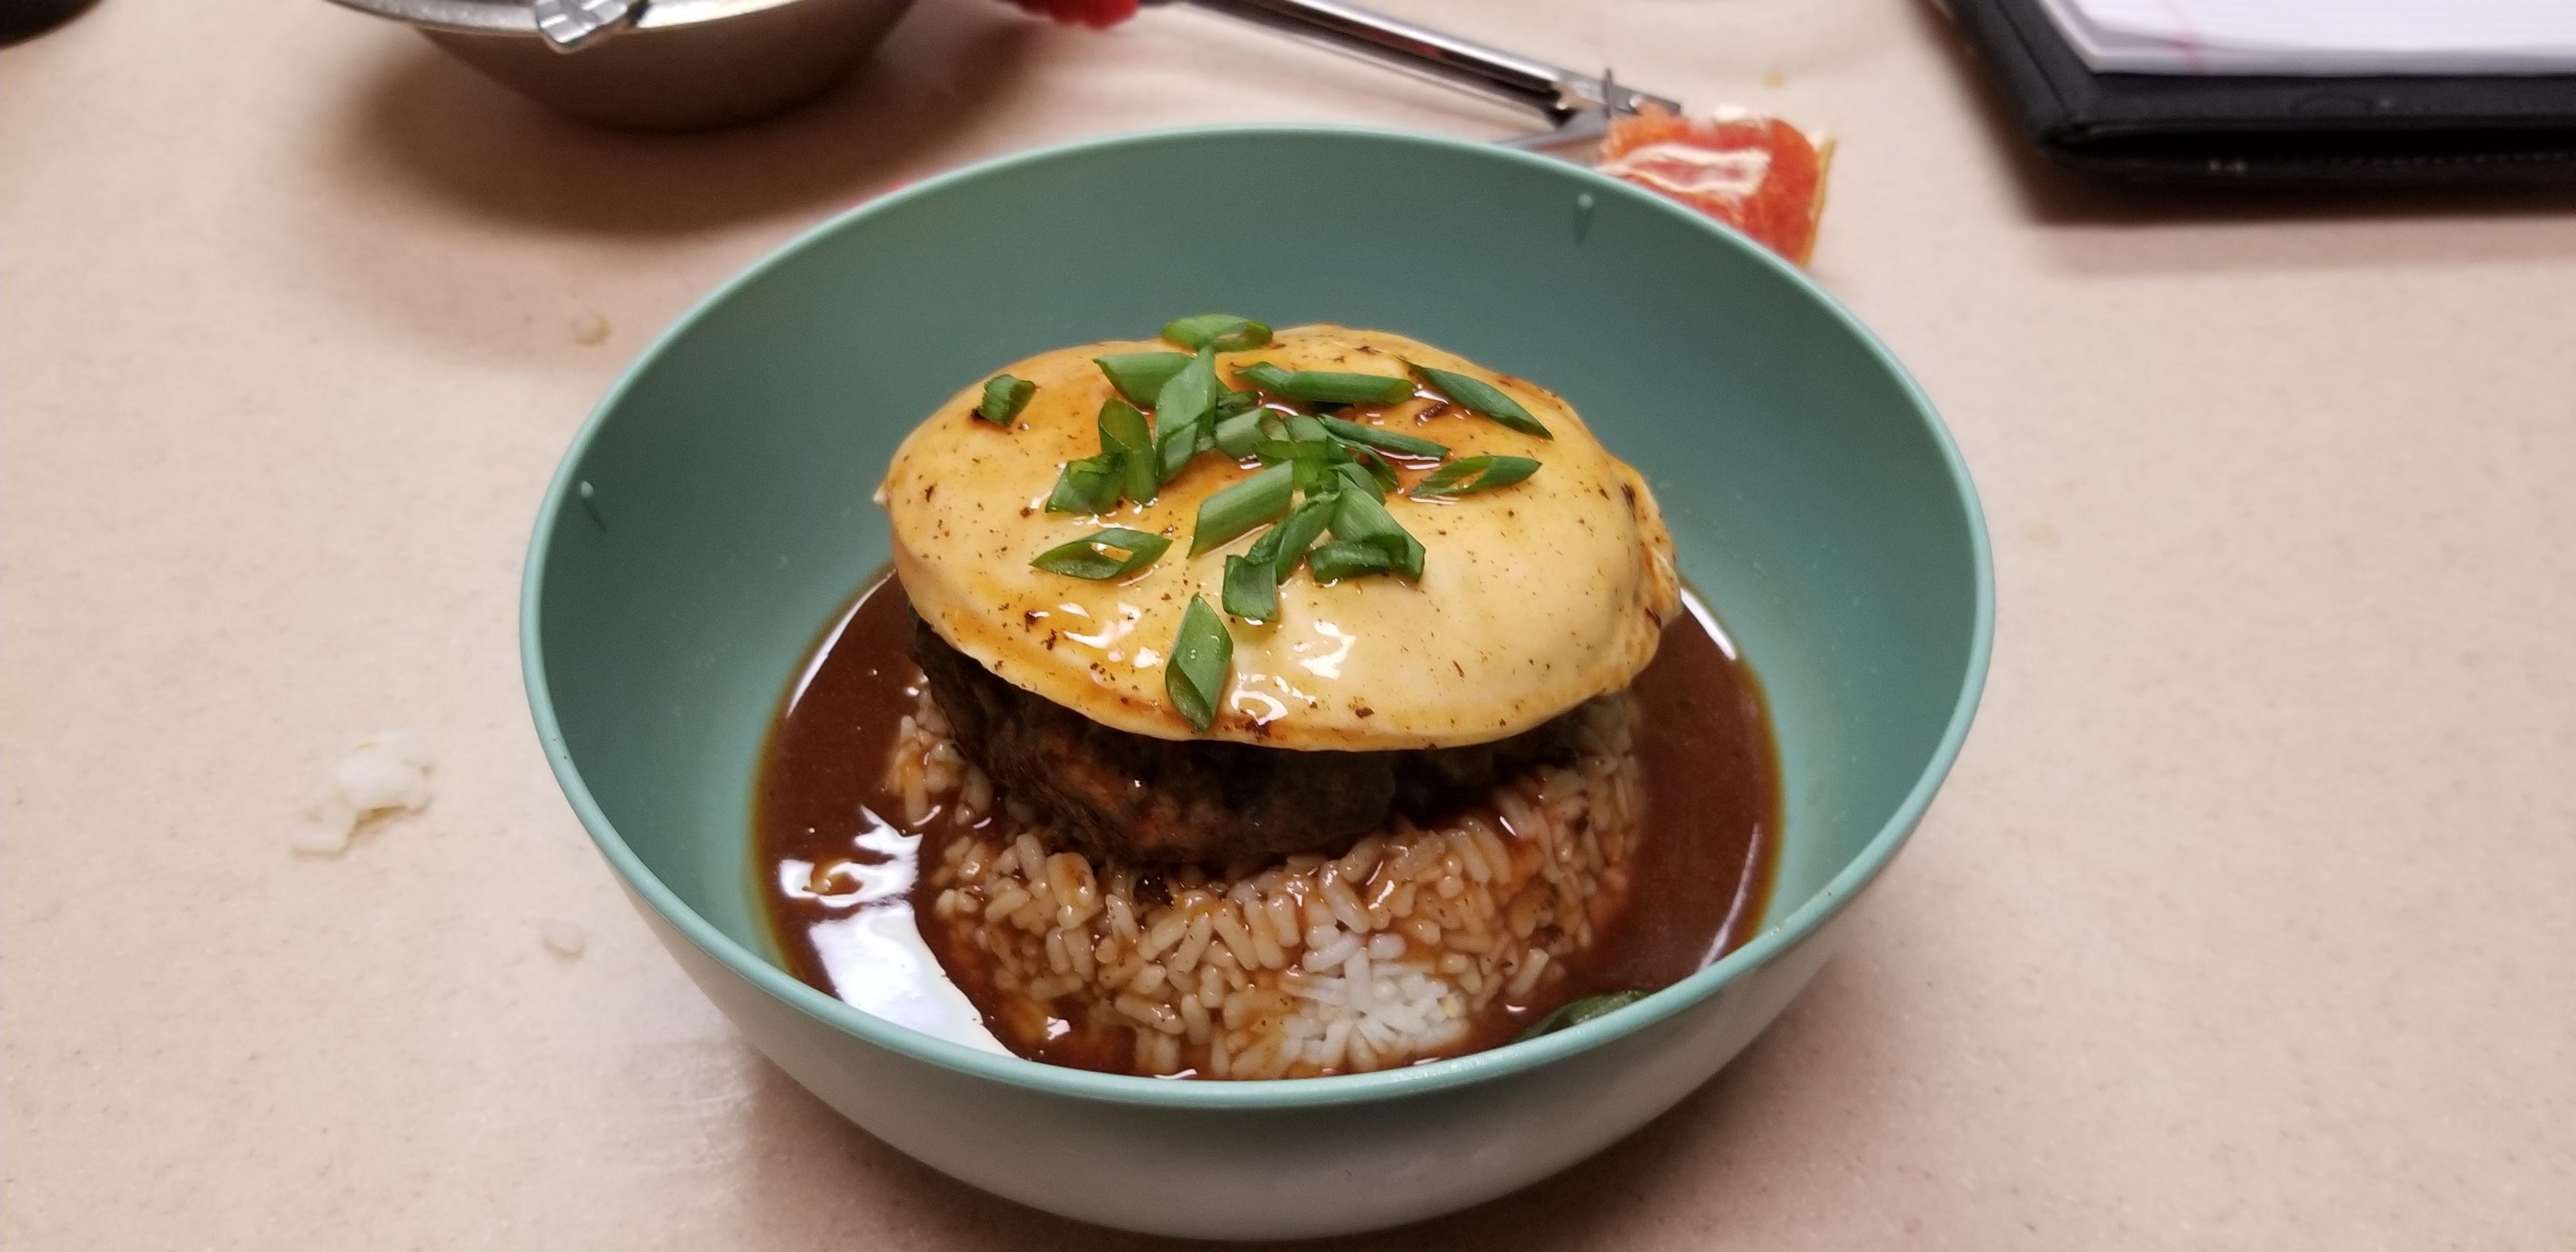 Chef John's Loco Moco